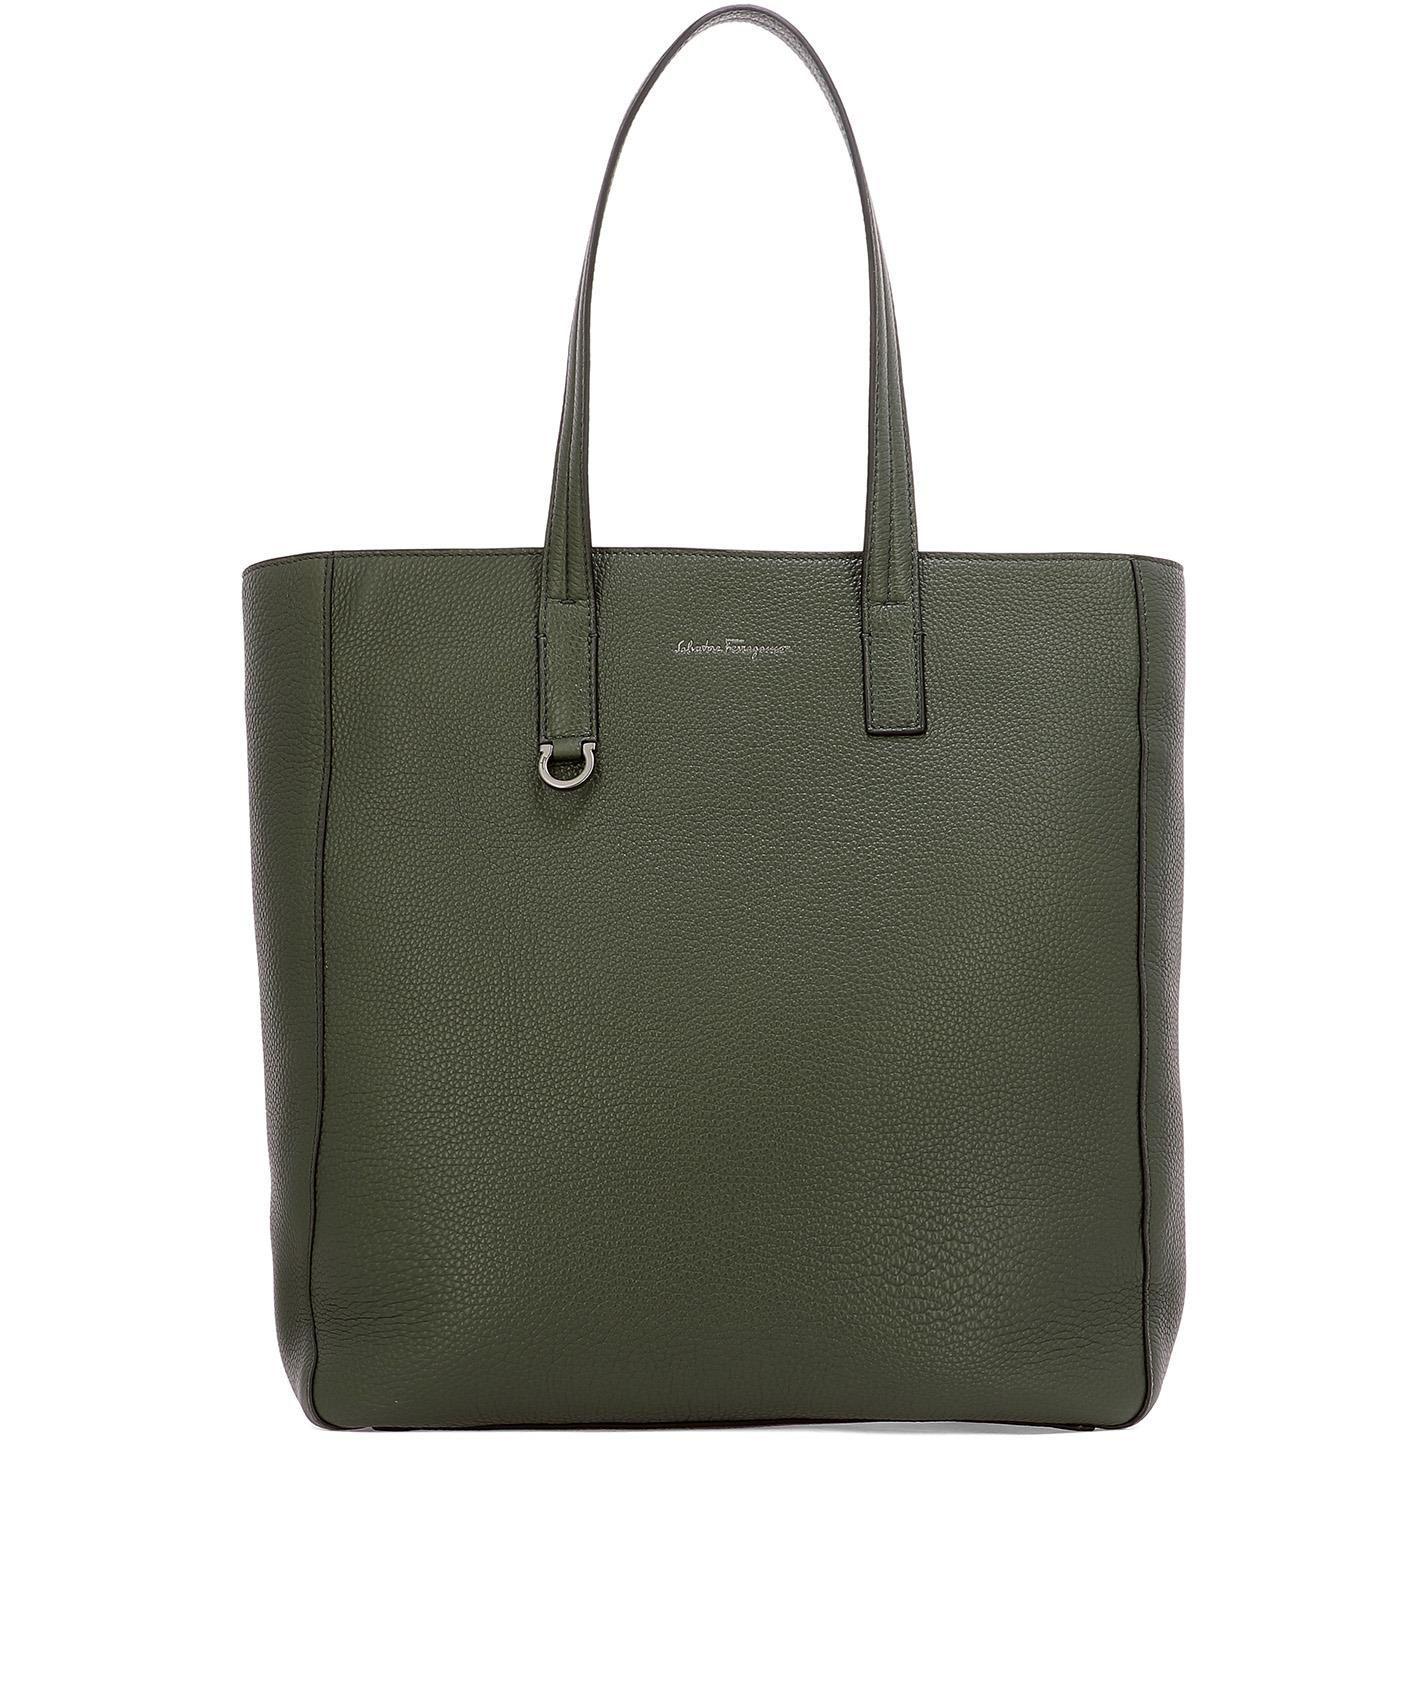 eadb7ad3eef2 Ferragamo Men s Green Leather Shoulder Bag in Green - Lyst